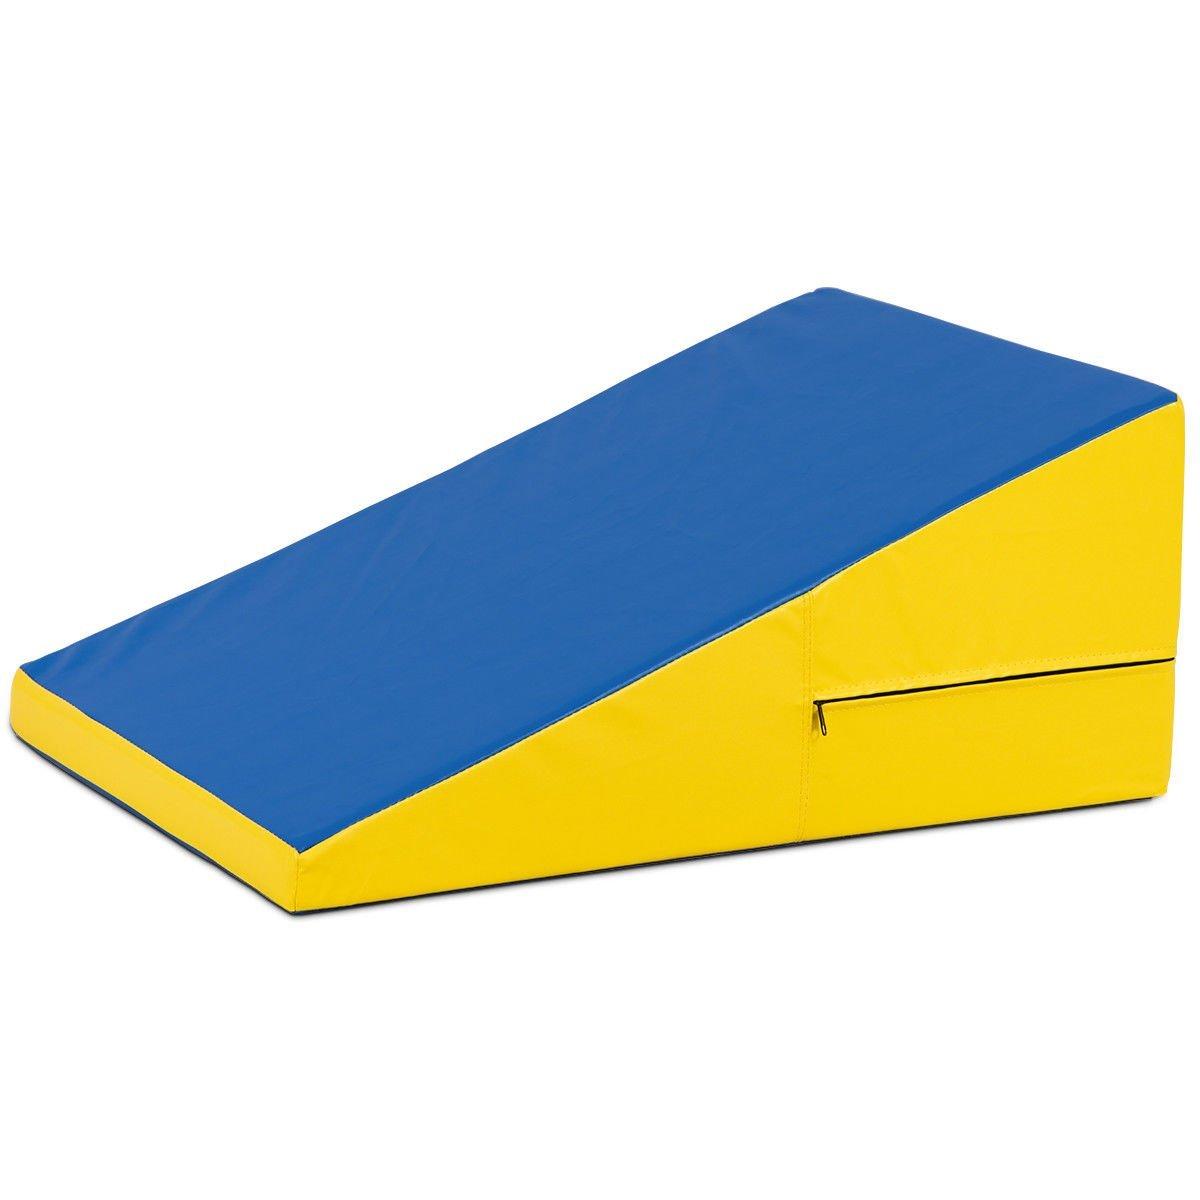 Giantex Incline Gymnastics Mat Wedge Folding and Non-Folding Gymnastics Gym Fitness Skill Shape Tumbling Mat for Kids Play Home Exercise Aerobics (Blue/Yellow/Non-Folding)